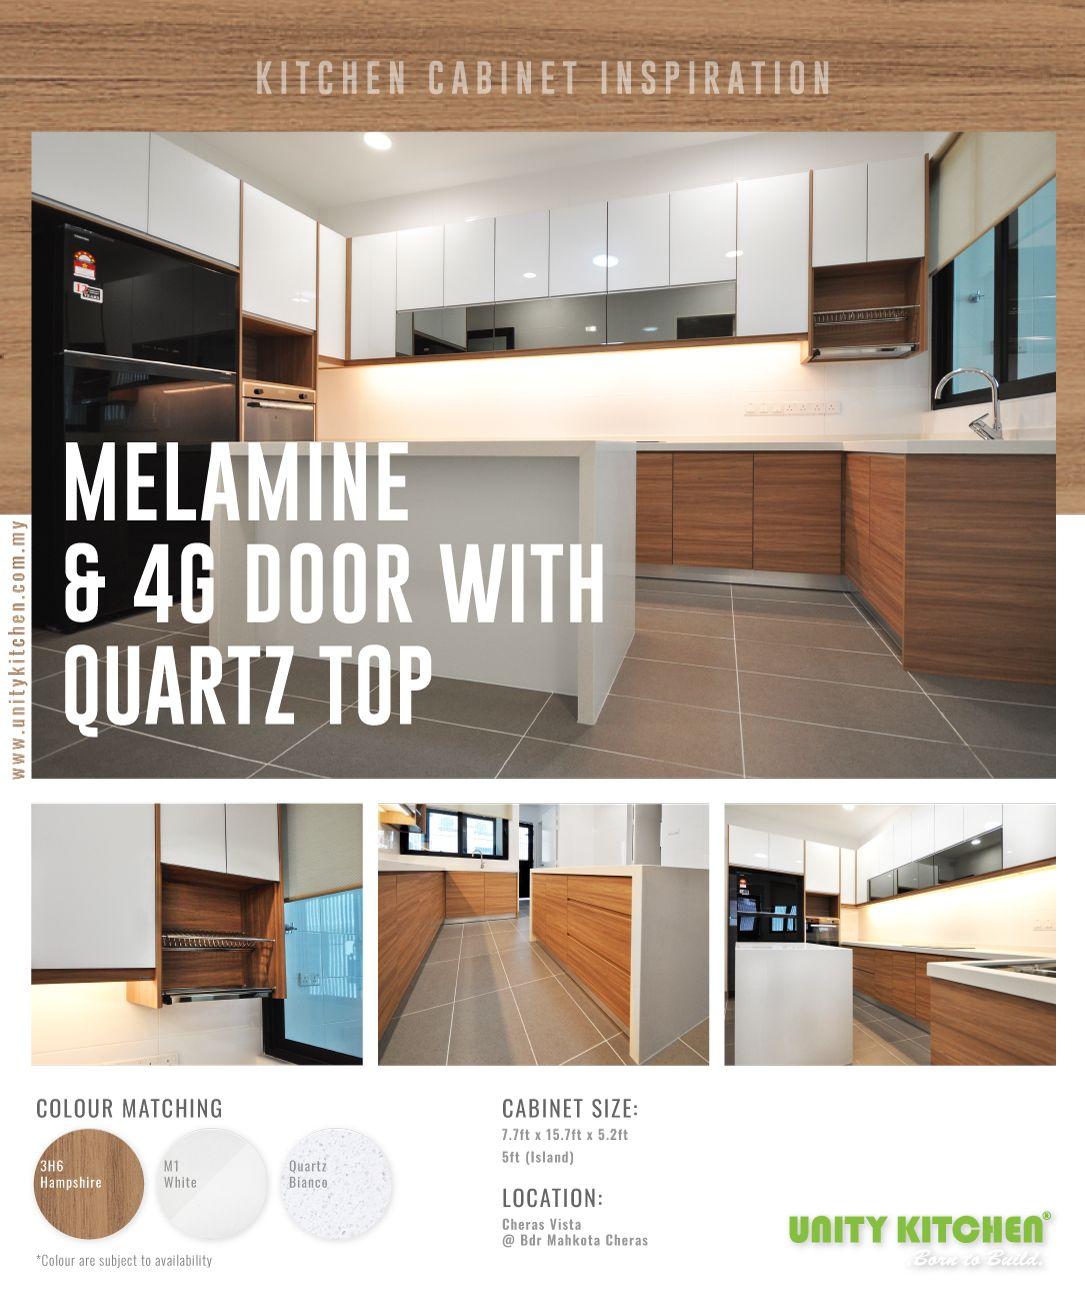 Kitchen Cabinet Taman Cheras Intan Block Klmn Cheras Batu 9 Apartments For Rent In Cheras Selangor